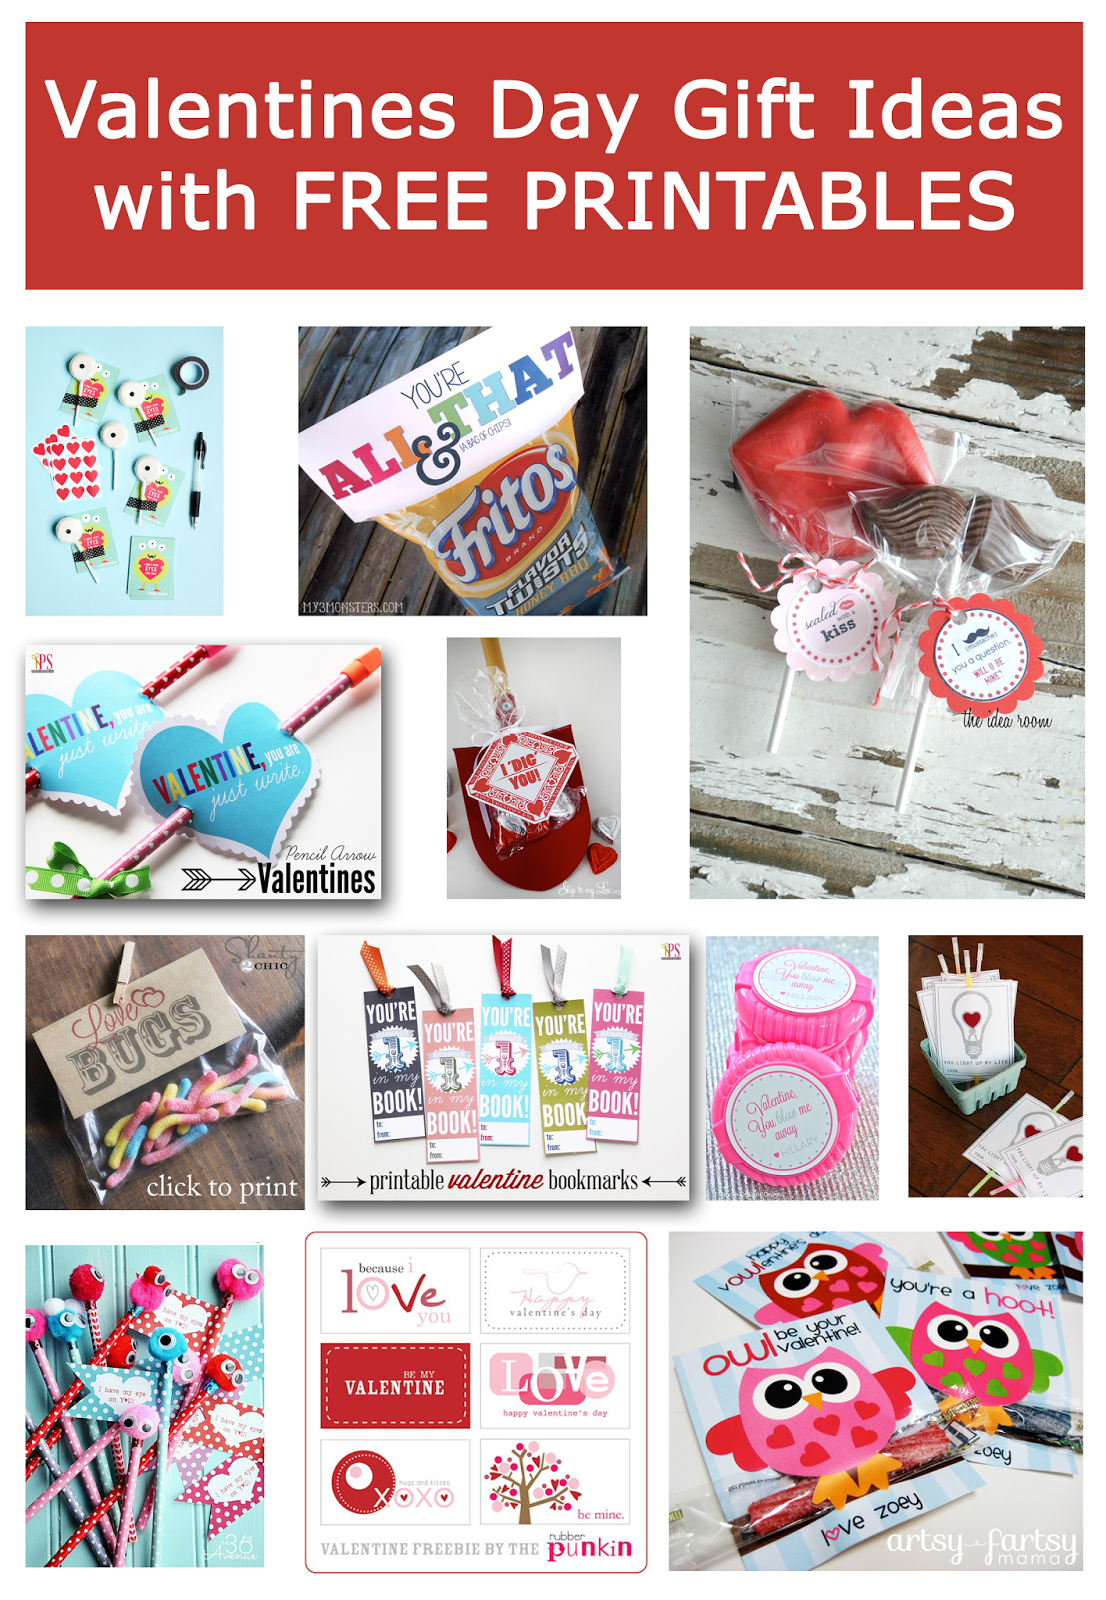 Delightful Order: Valentines Day Gift Ideas & Free Printables Free Printable Valentine's Day Decorations